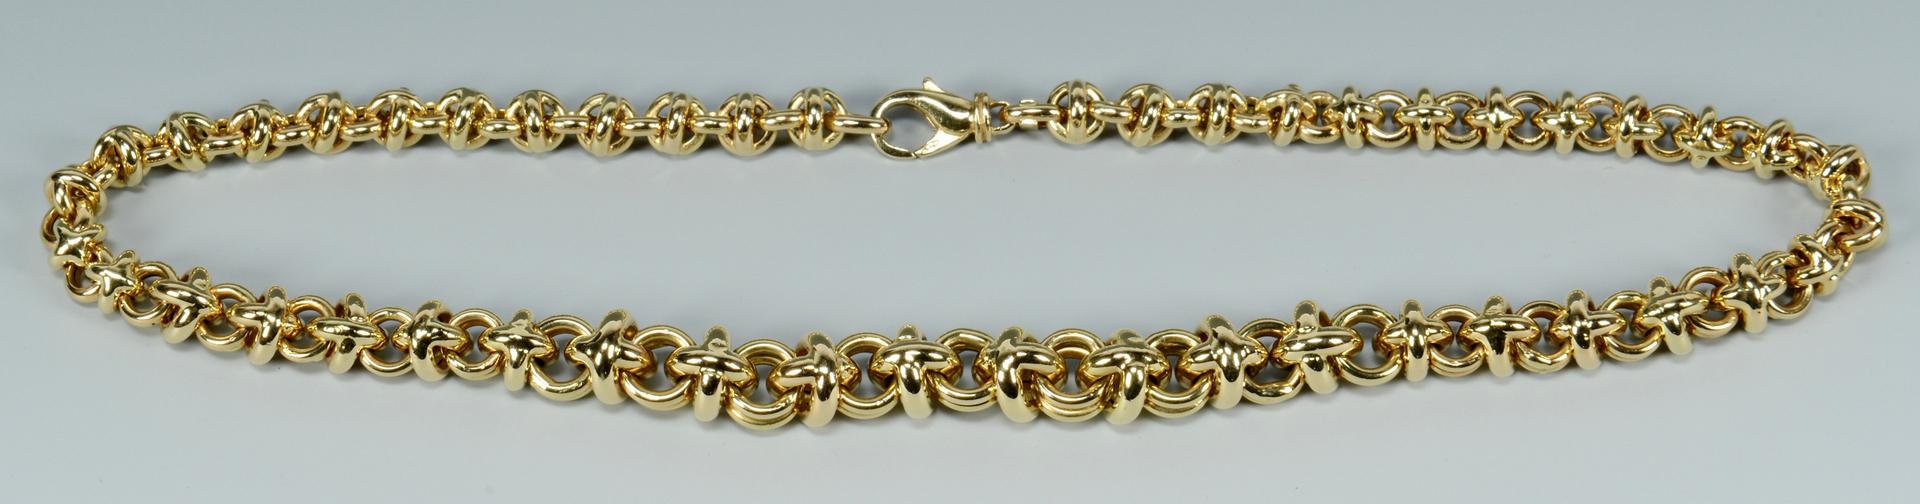 Lot 3088067: 14k Graduated Link Necklace